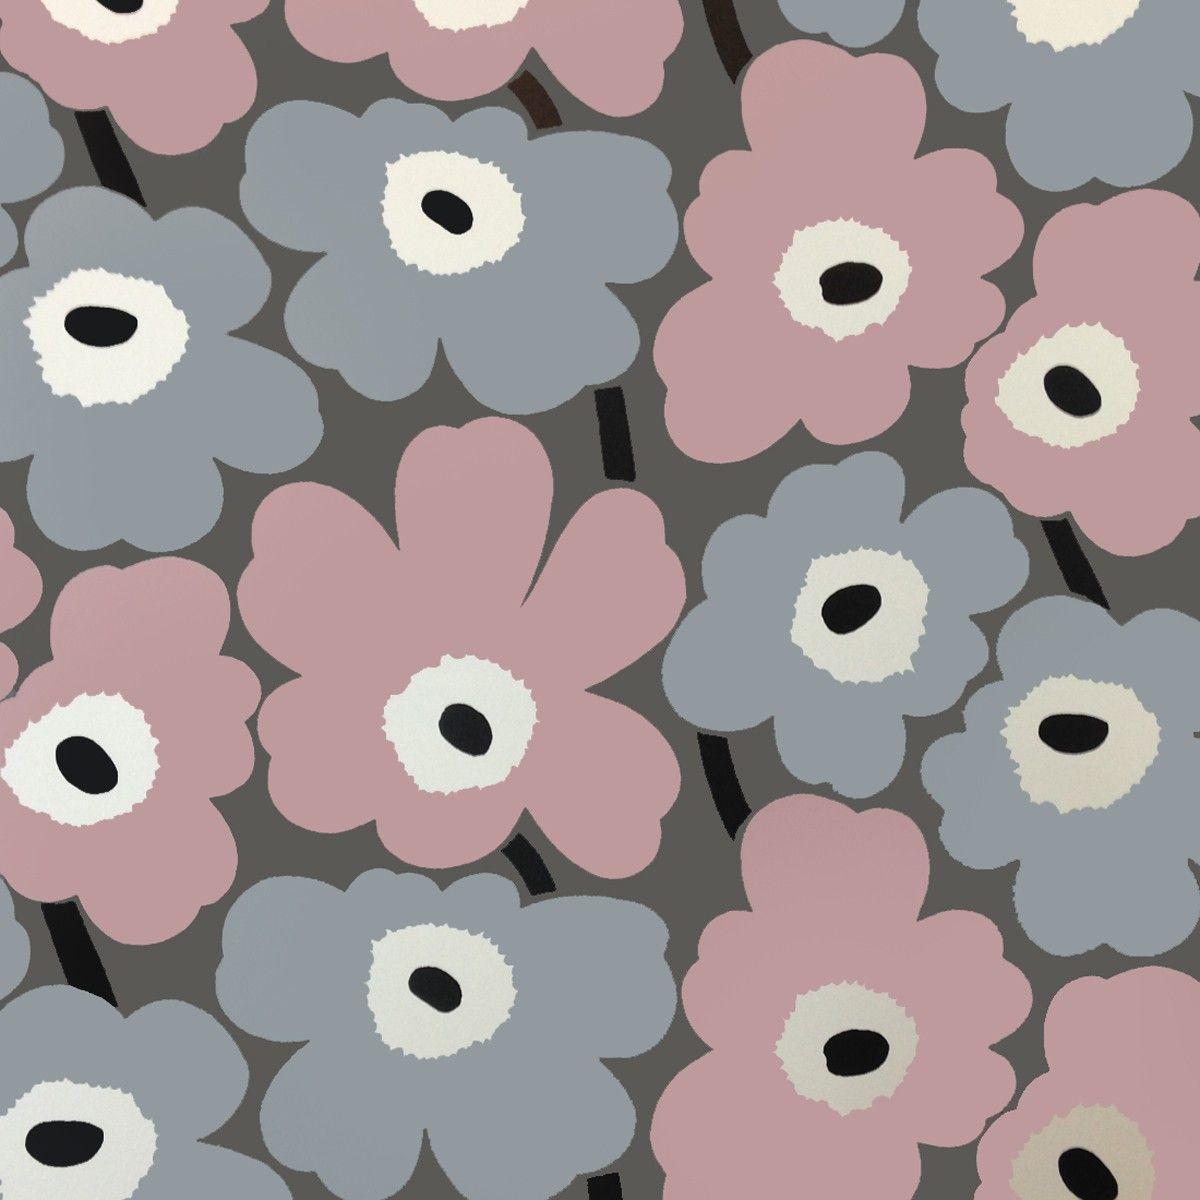 marimekko pieni unikko wallpaper v riyhdistelmi pinterest marimekko wallpaper and patterns. Black Bedroom Furniture Sets. Home Design Ideas